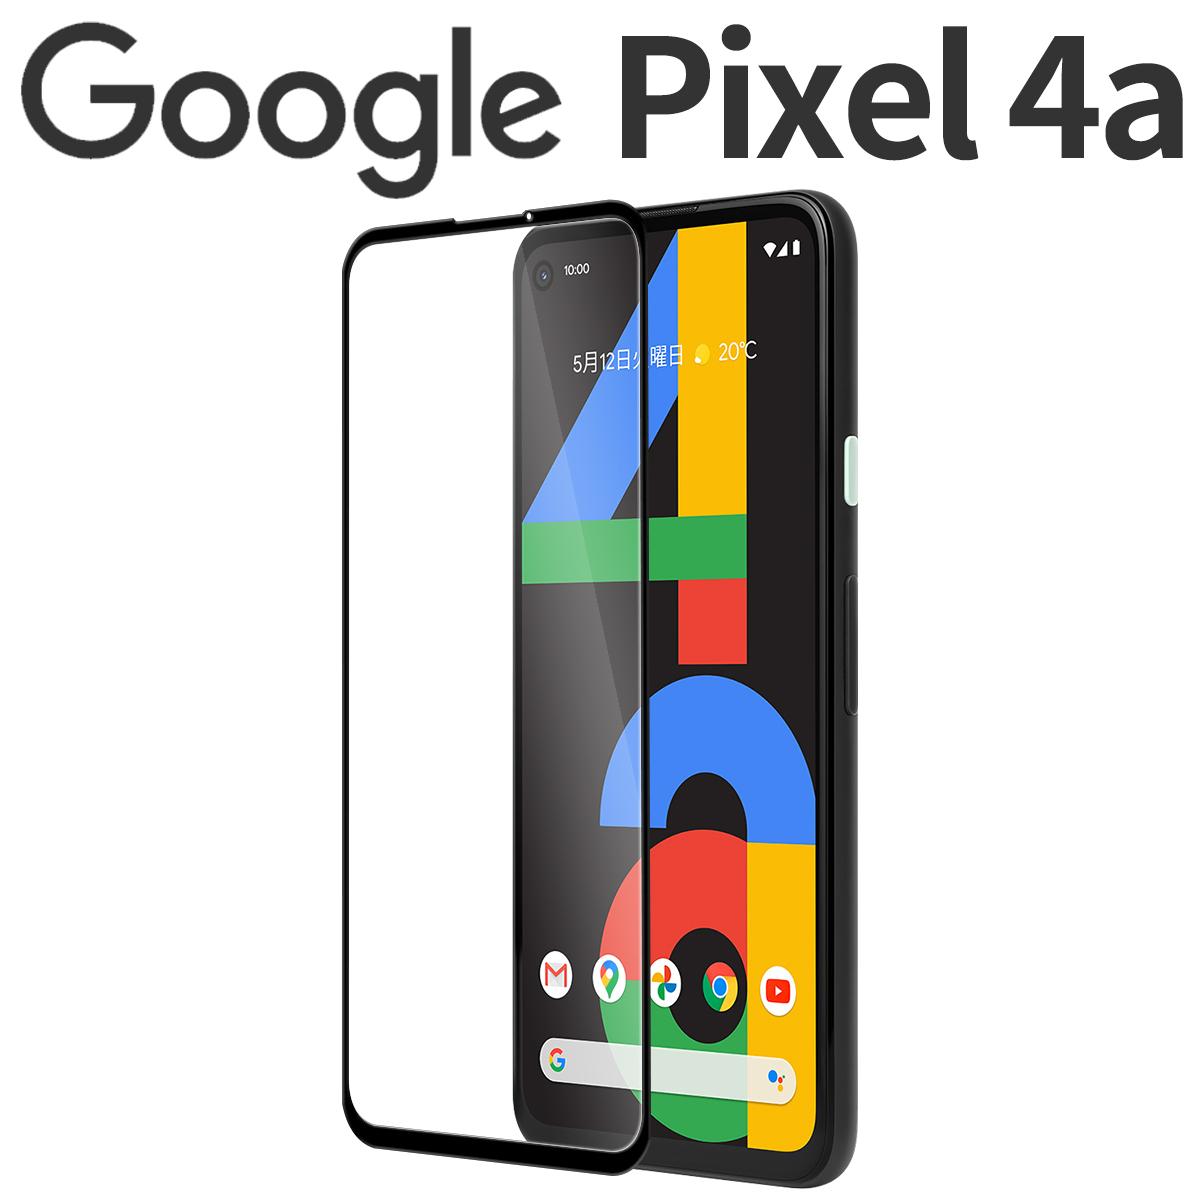 Google Pixel 4a 全面吸着カラー強化ガラス保護フィルム 9H